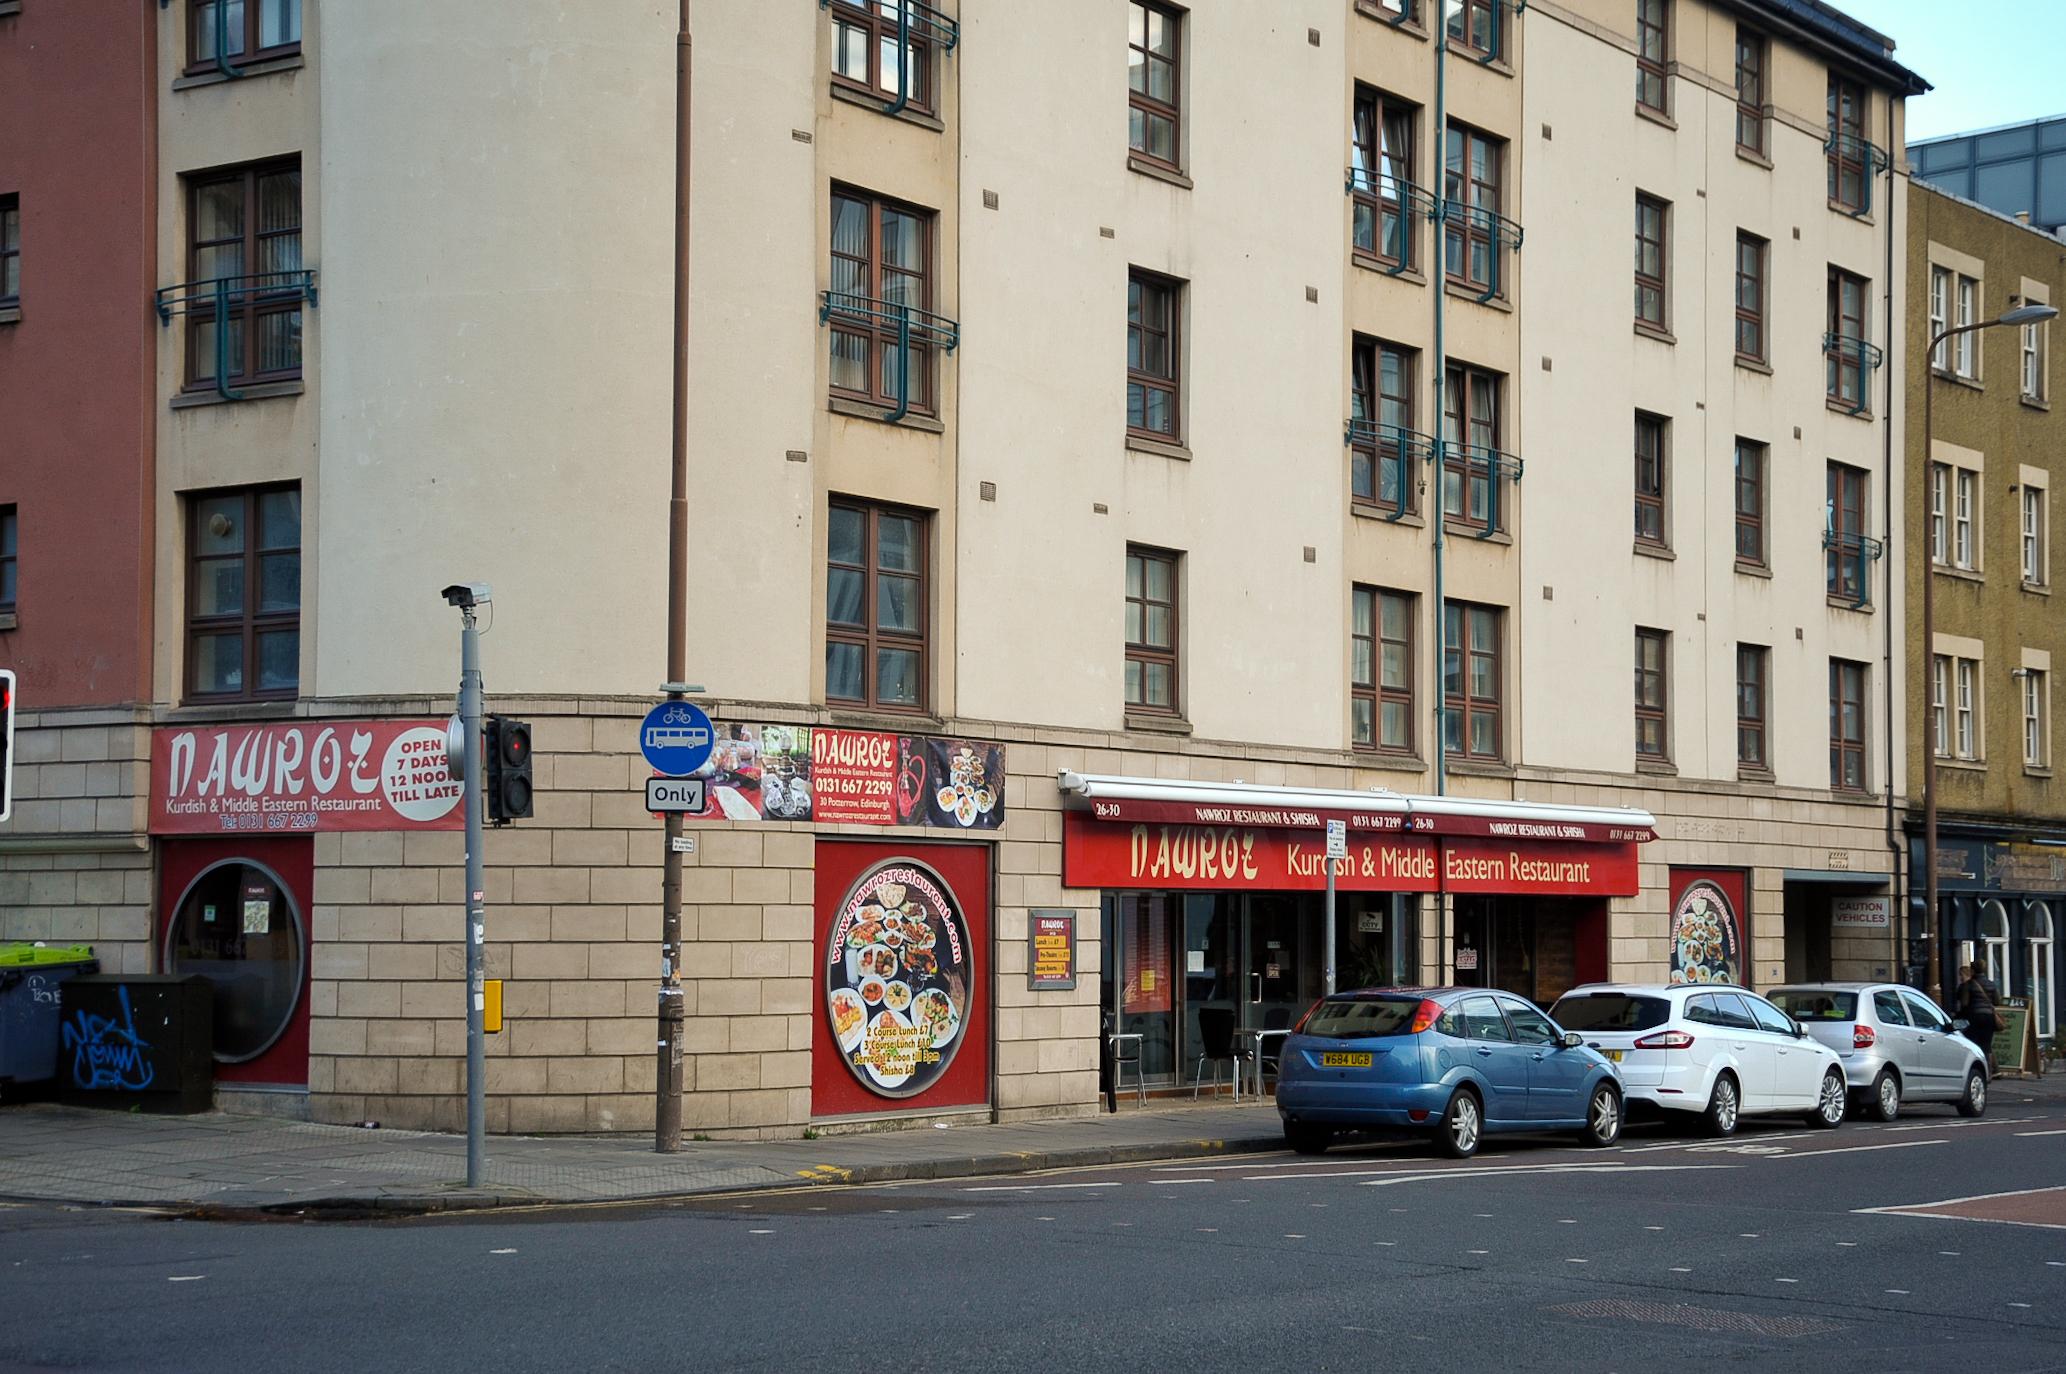 Nawroz, Restaurants, Edinburgh